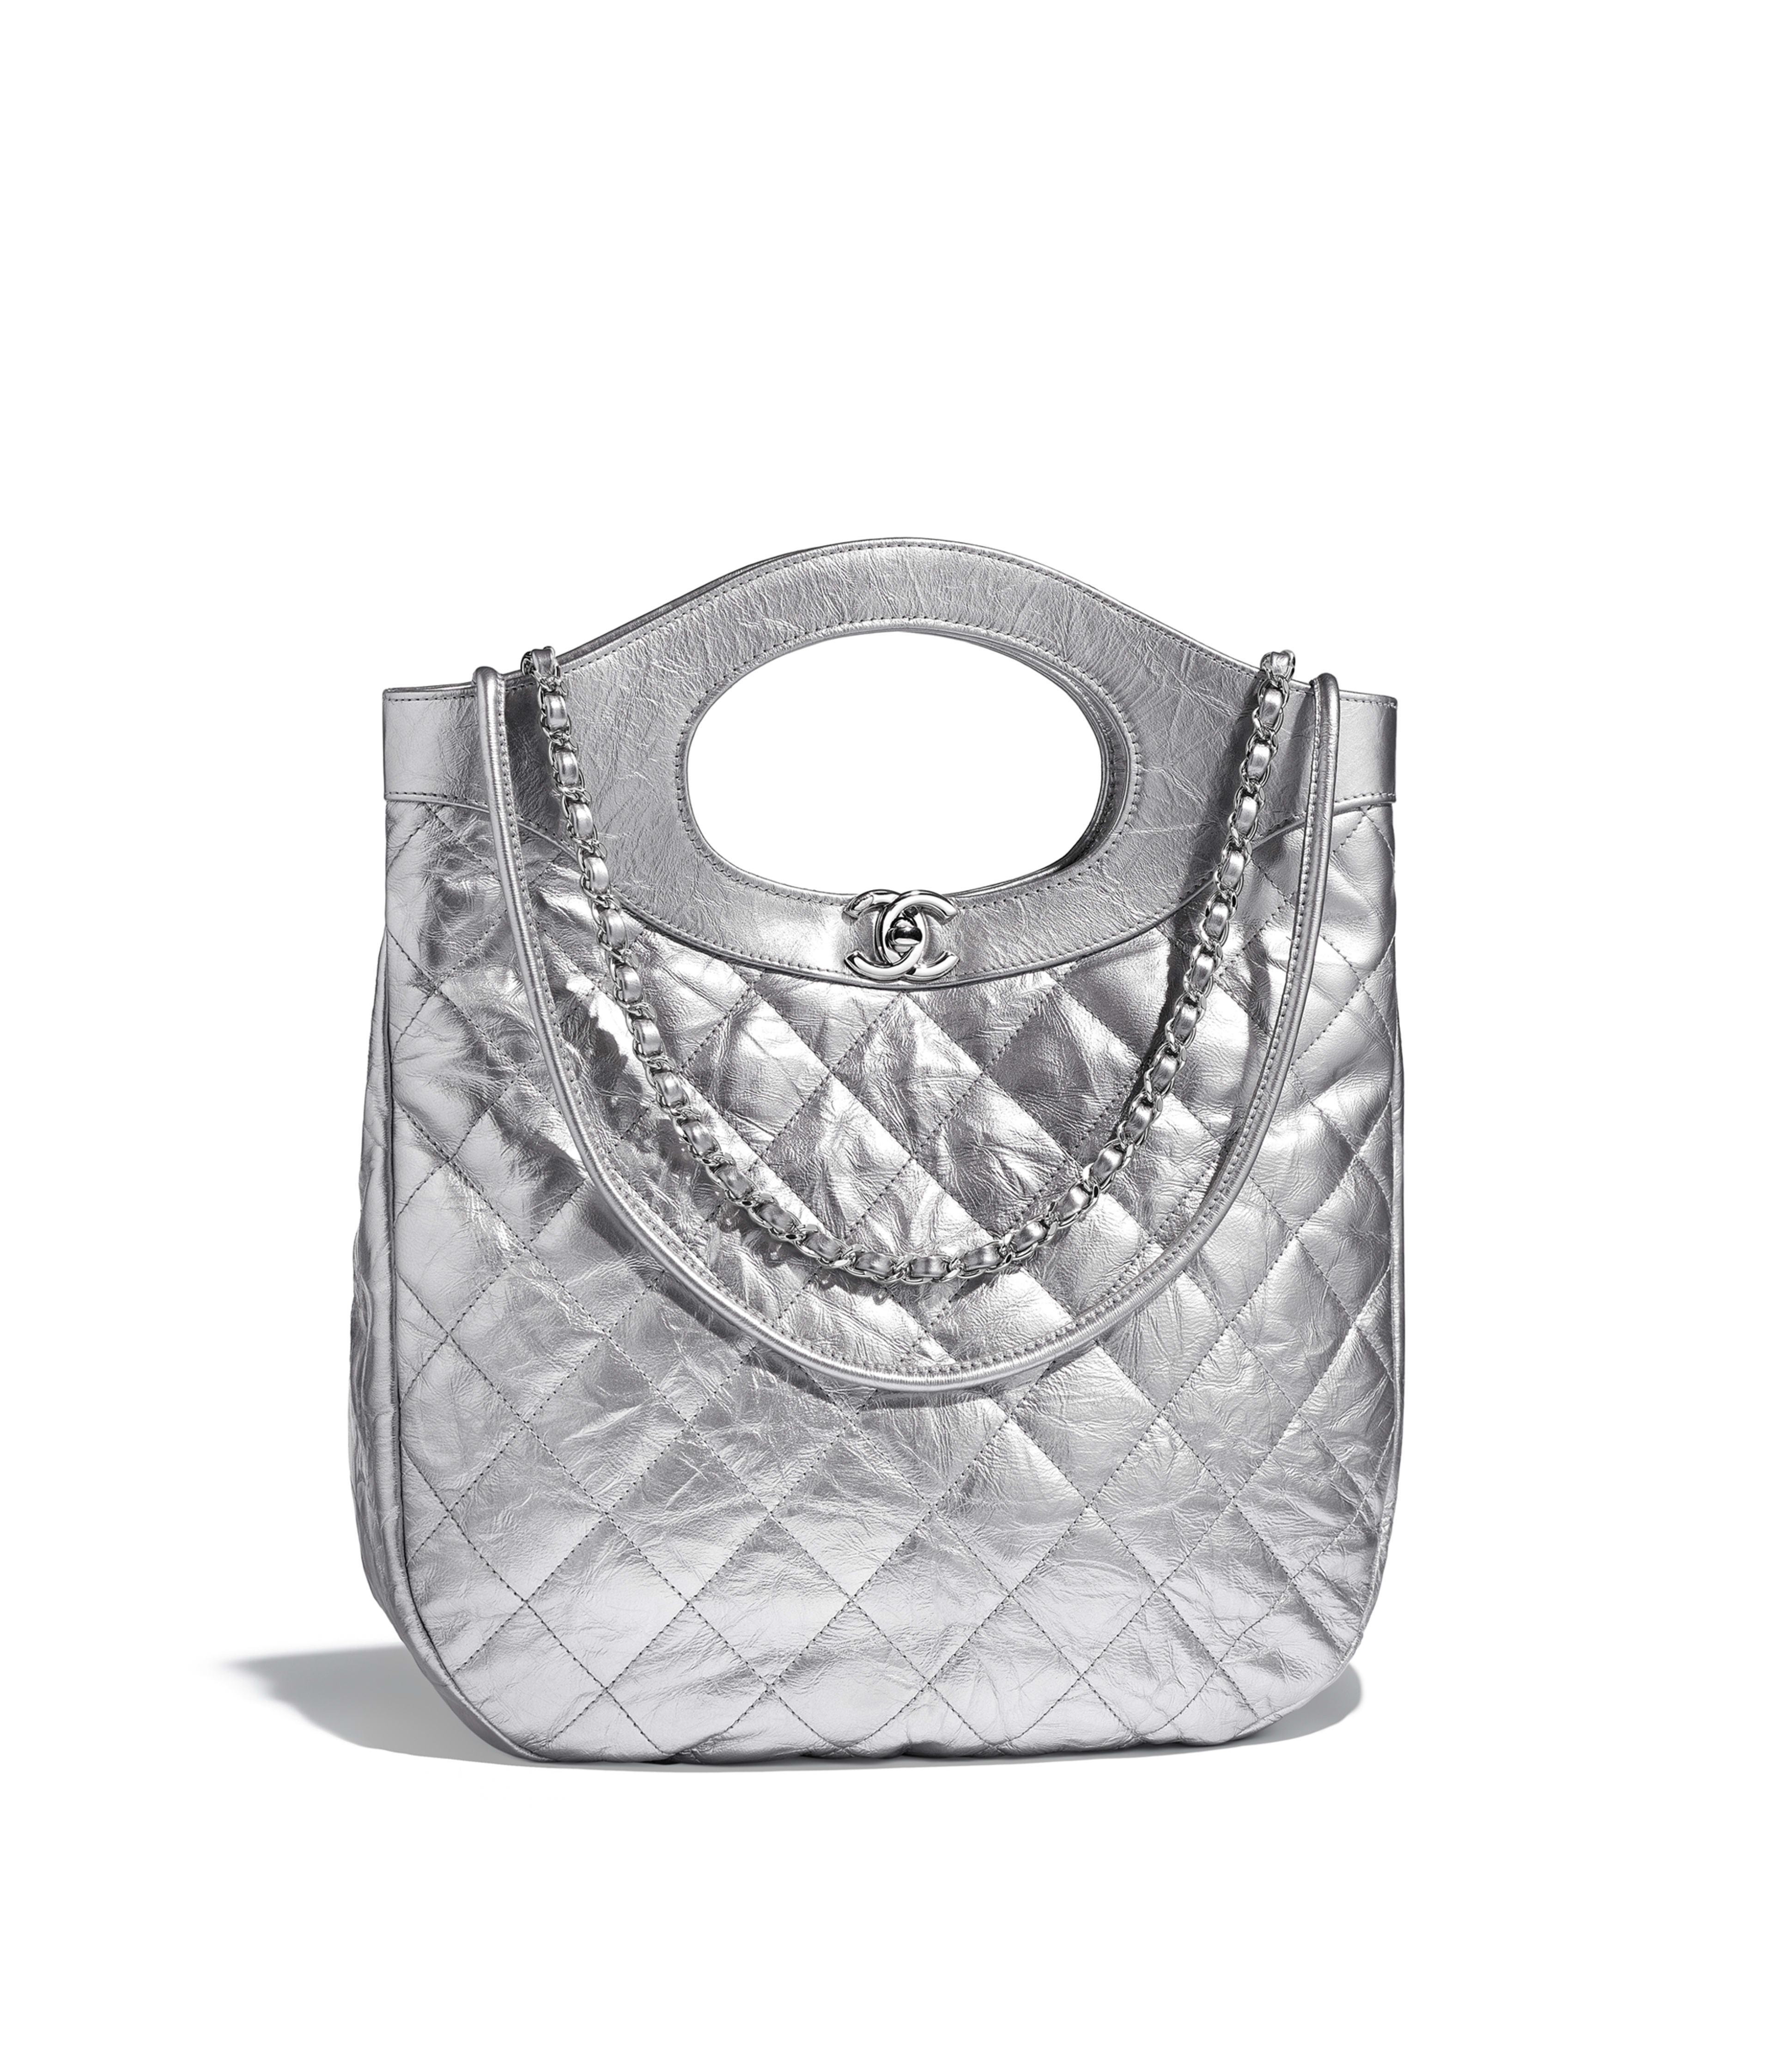 64608cf8522c CHANEL 31 Small Shopping Bag Metallic Crumpled Calfskin   Silver-Tone  Metal